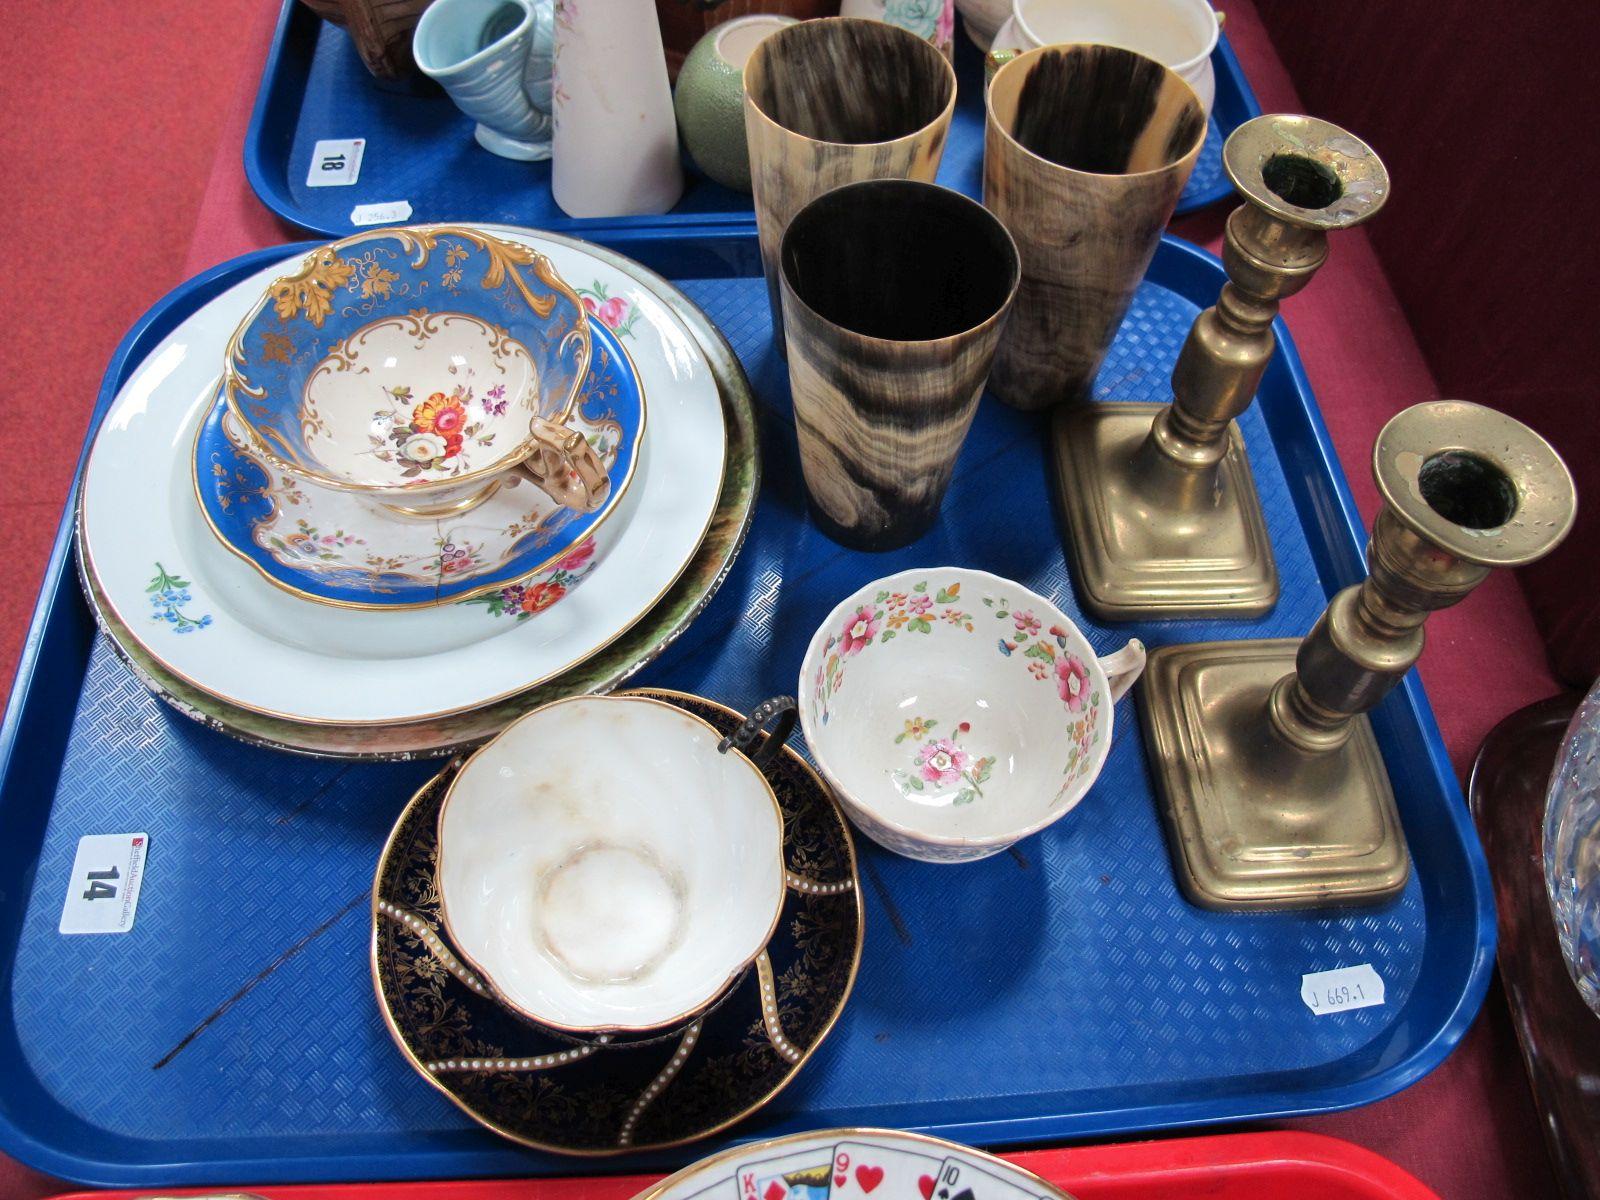 Lot 14 - Three XIX Century Horn Beakers, pair of XIX Century brass candlesticks, Aynsley cup in a